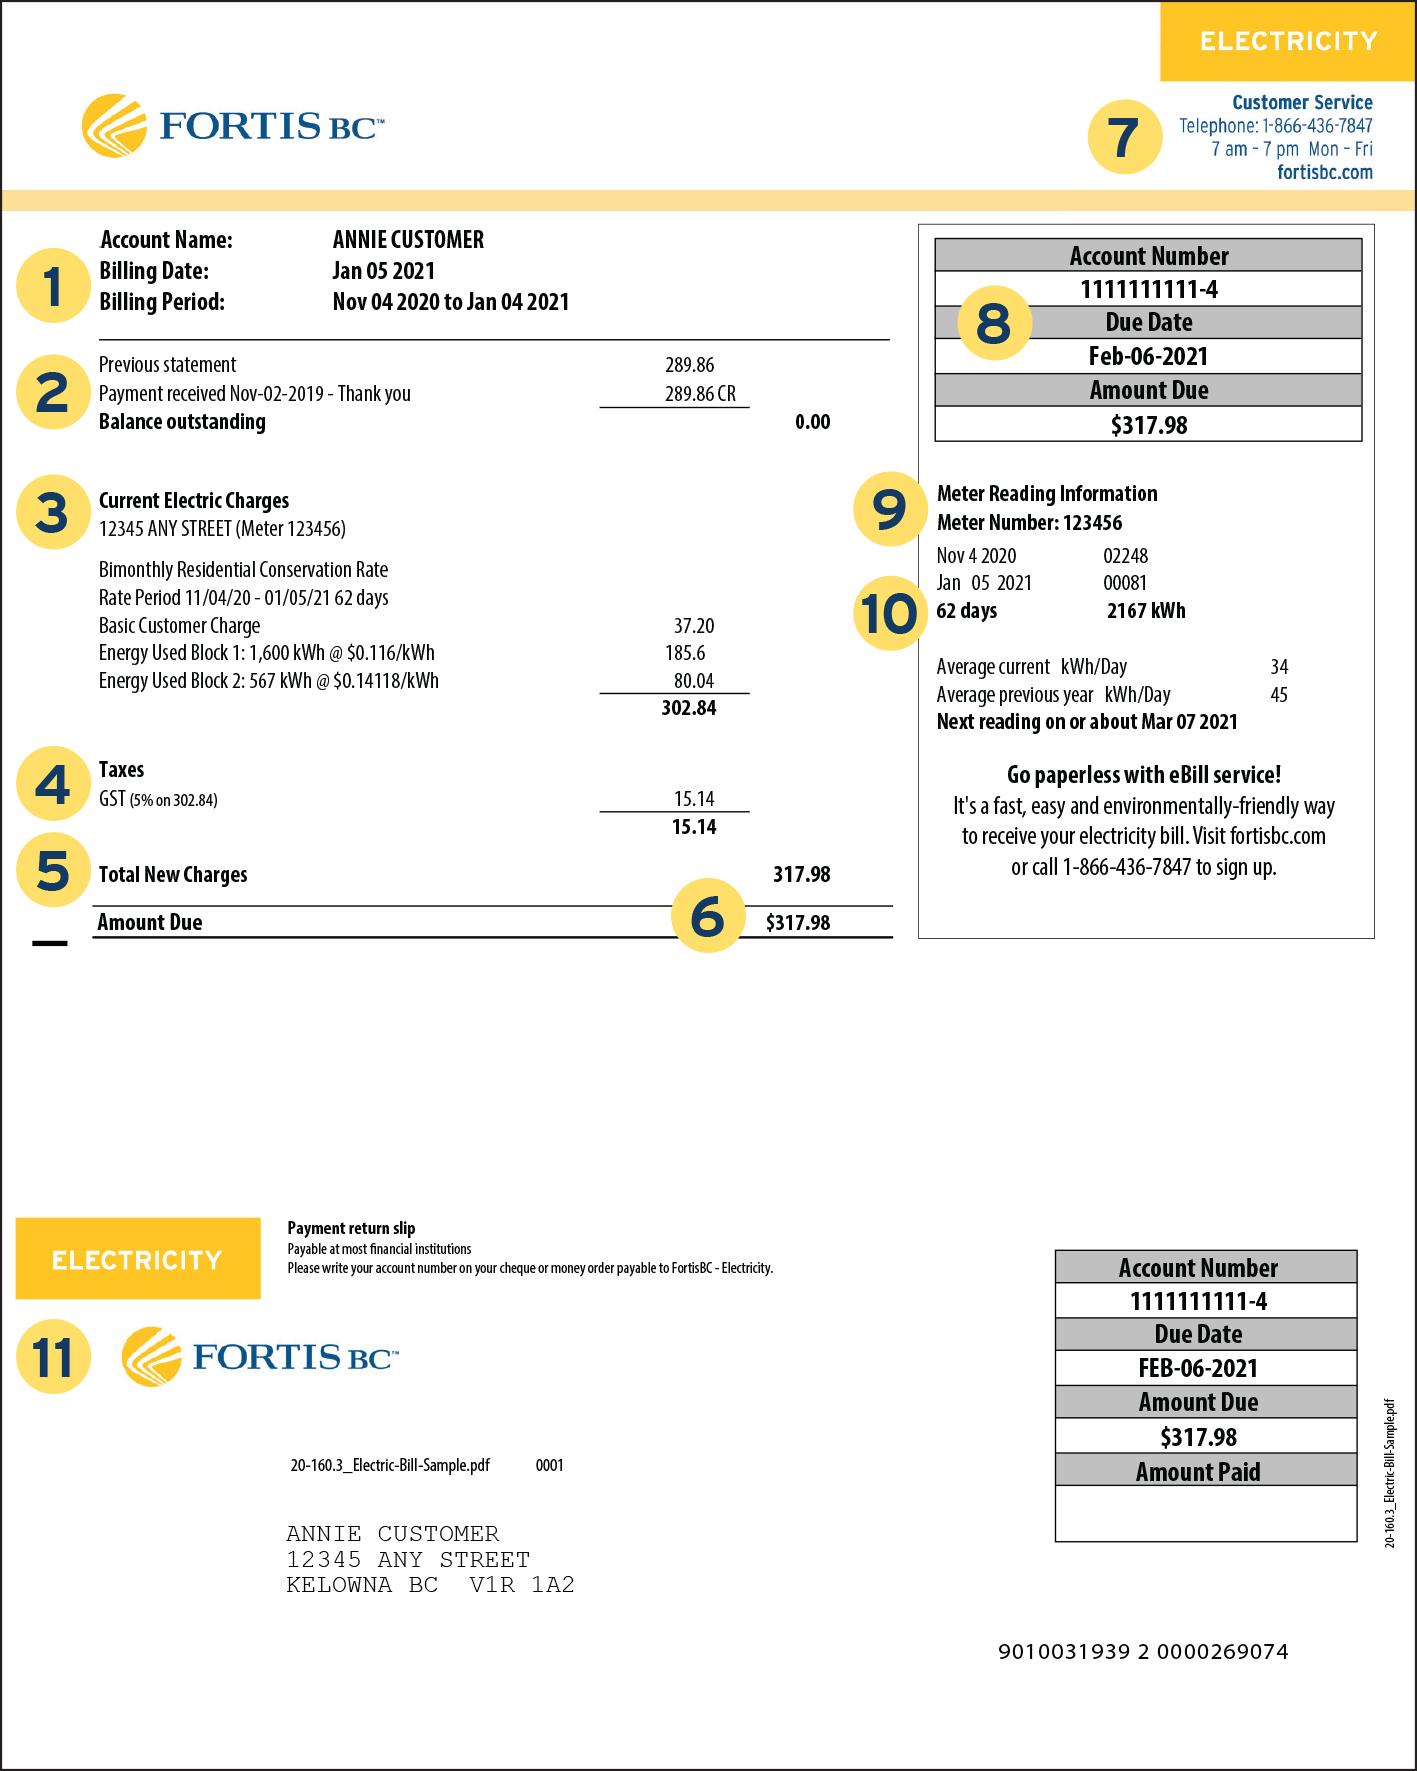 Electric bill sample